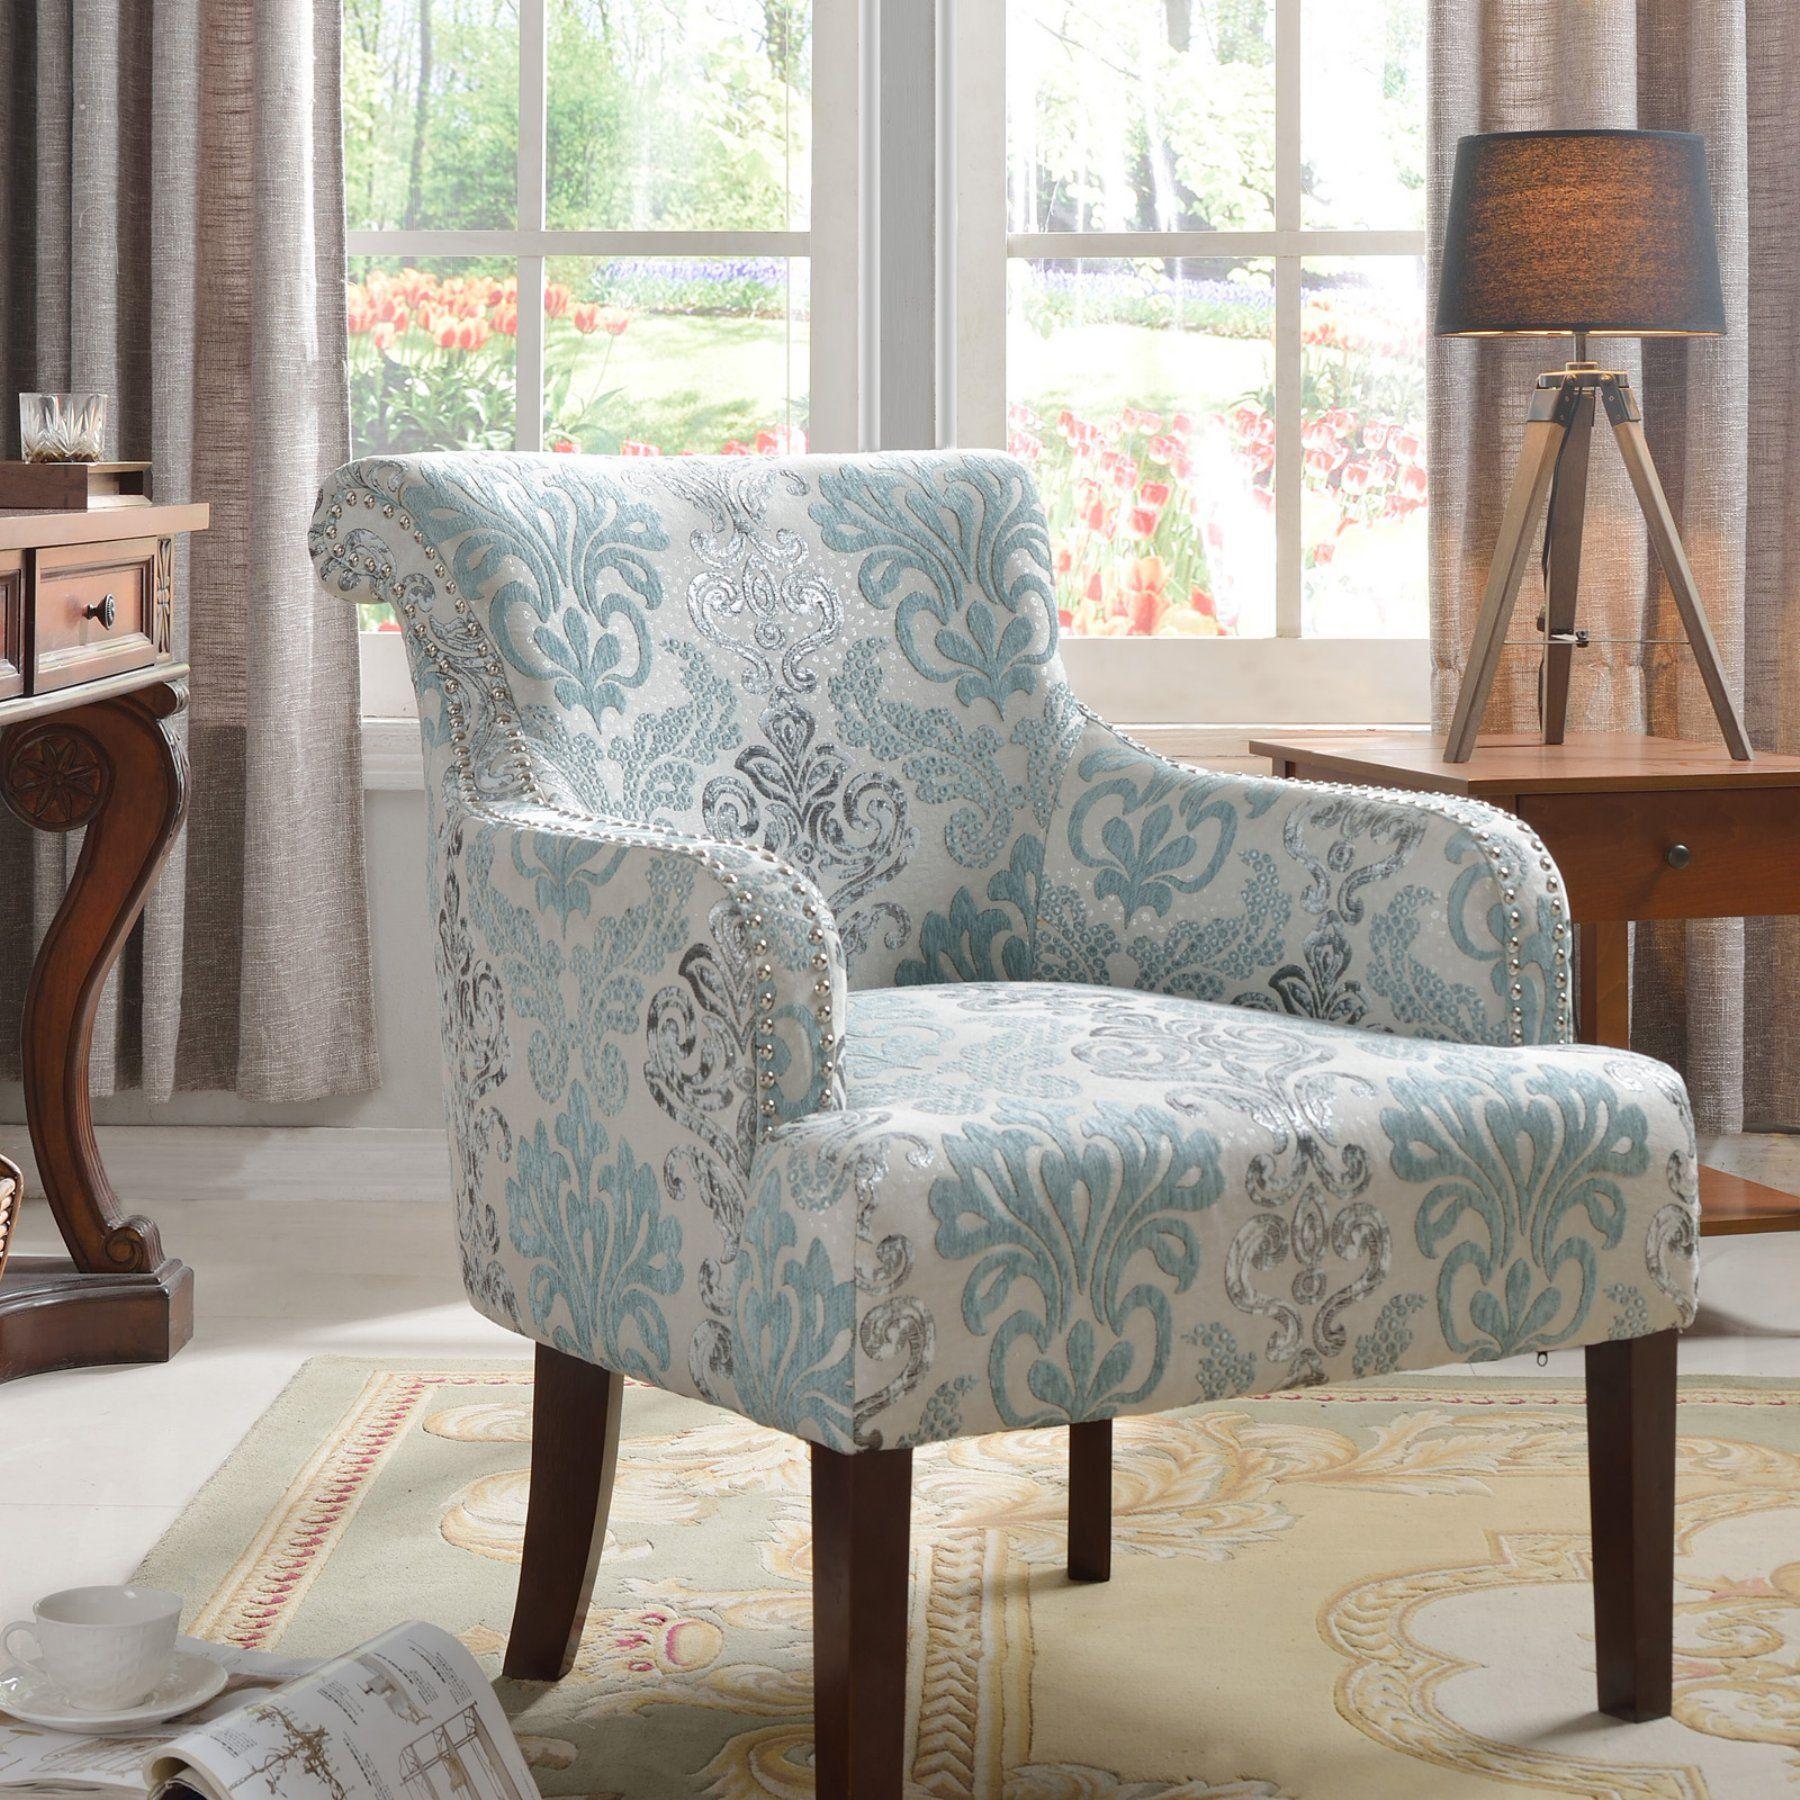 Best Master Furniture Regency Teal Floral Living Room Accent Chair